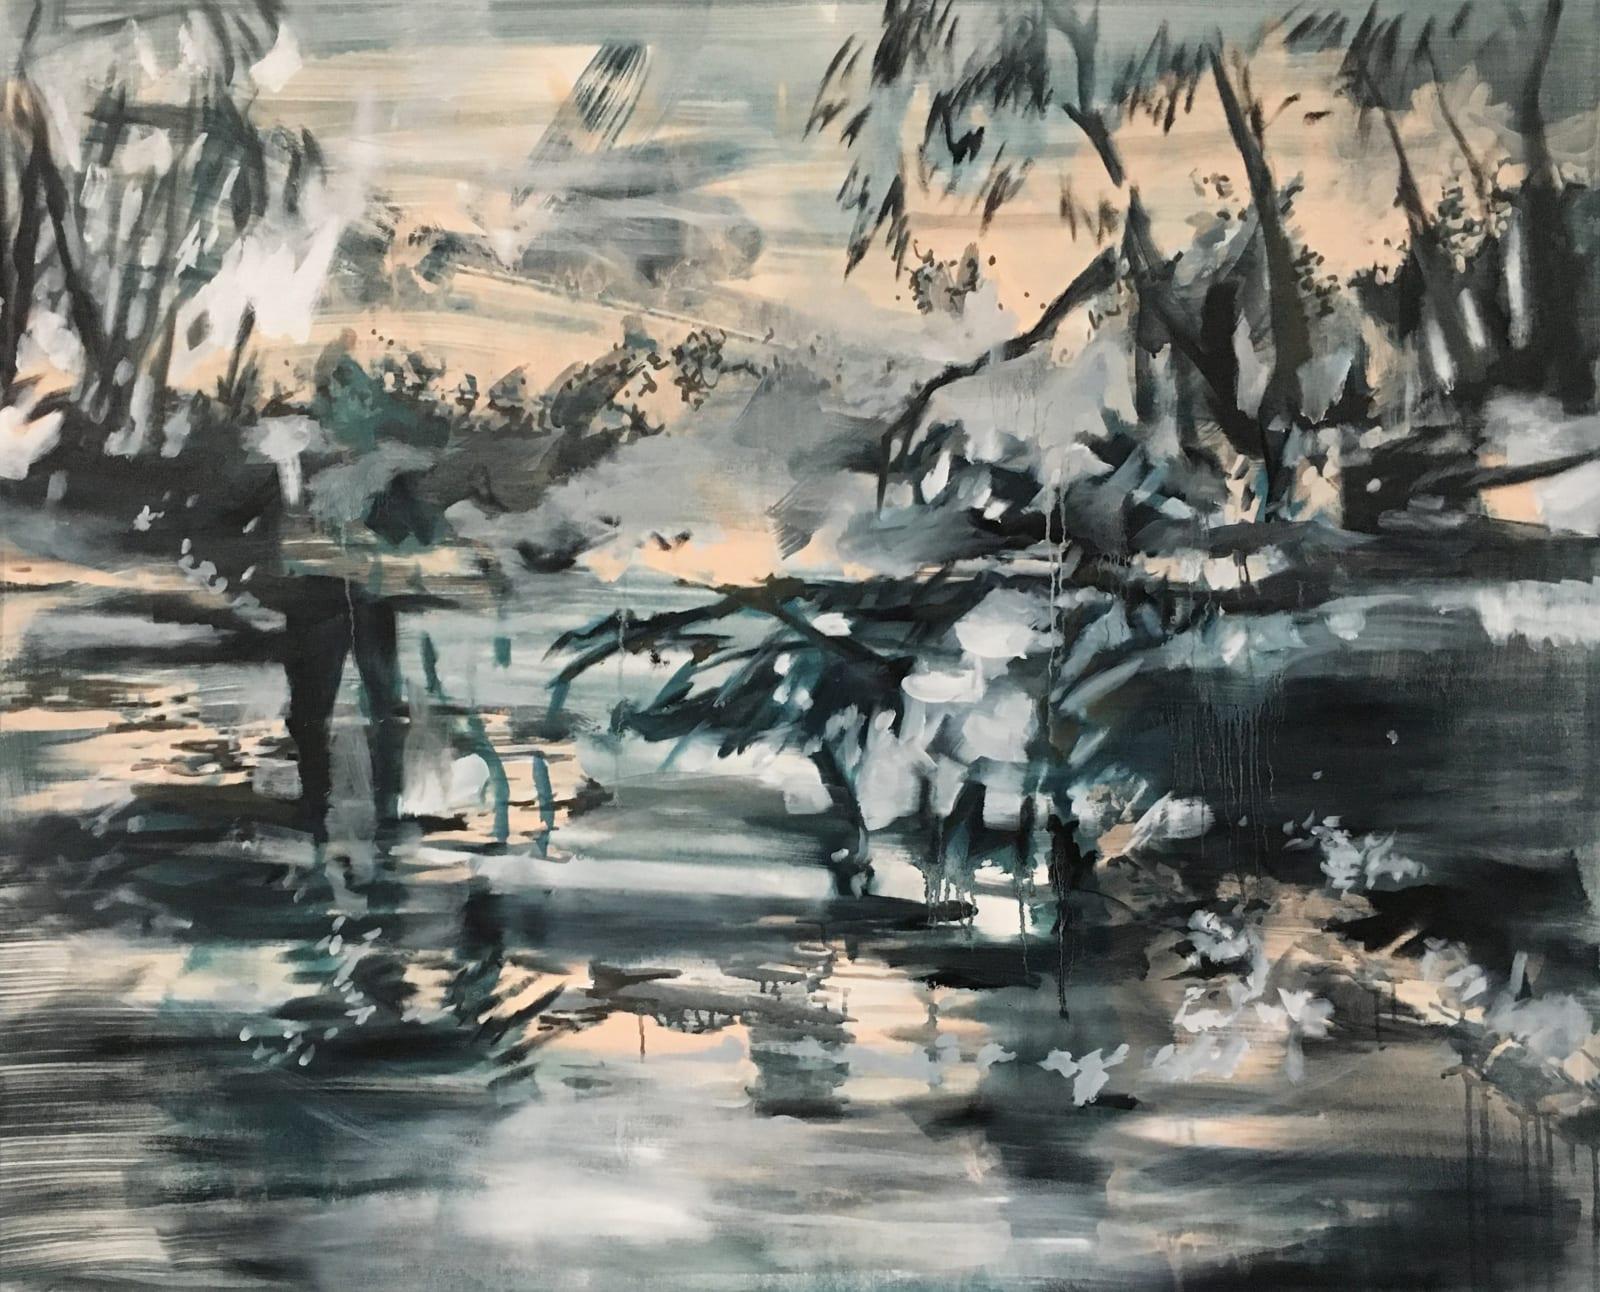 Elizabeth Schwaiger, Rising Tides, 2019